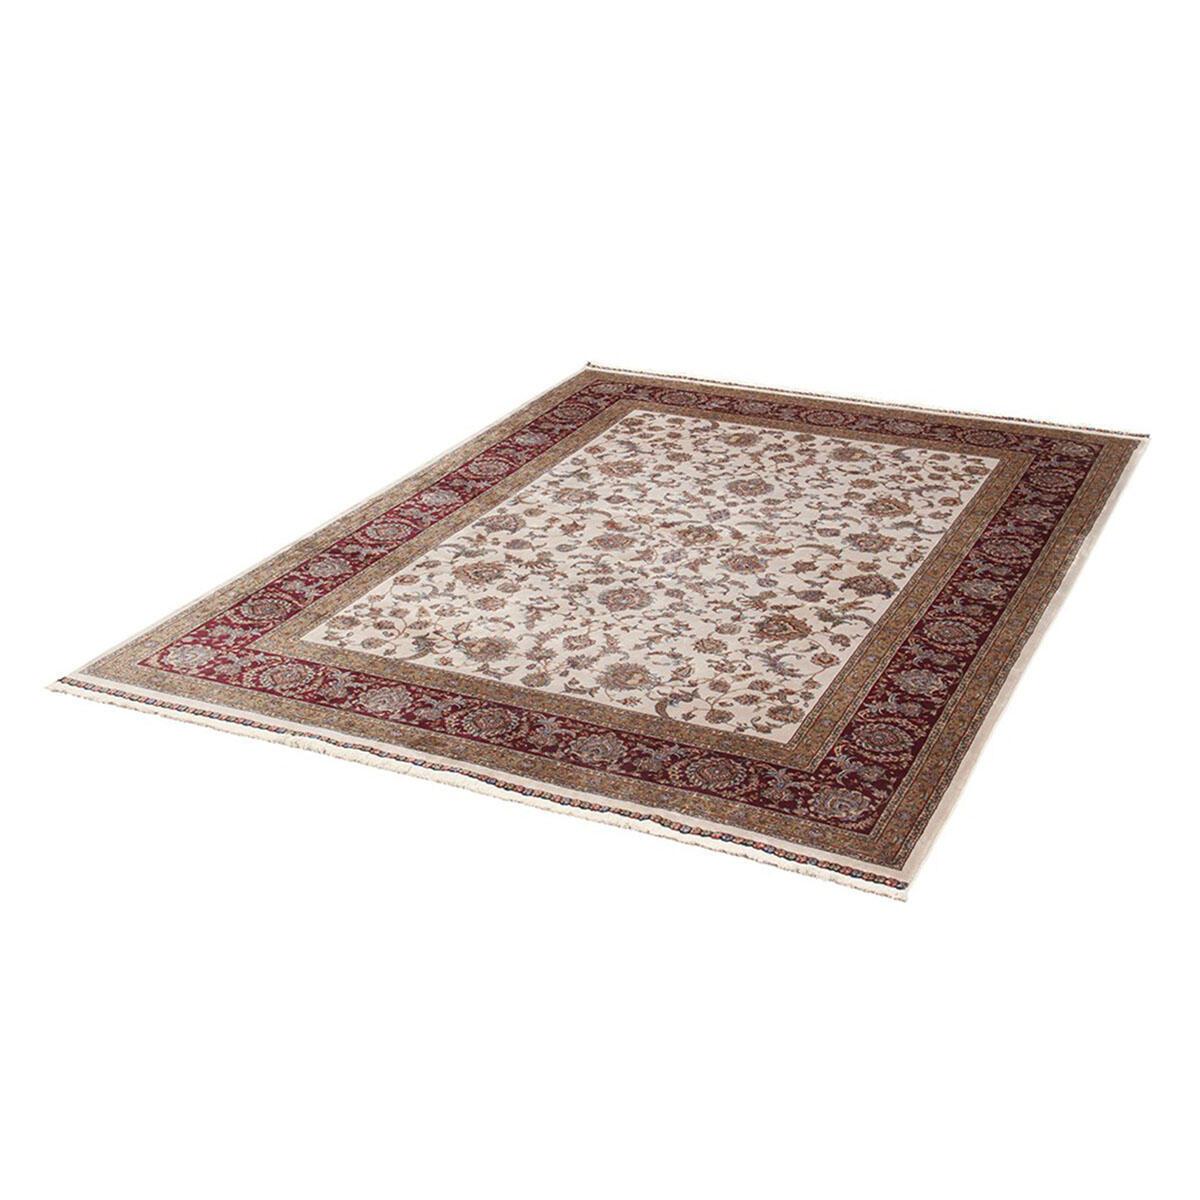 Tappeto Qoum Shah 2 in cotone, beige, 200x300 - 5